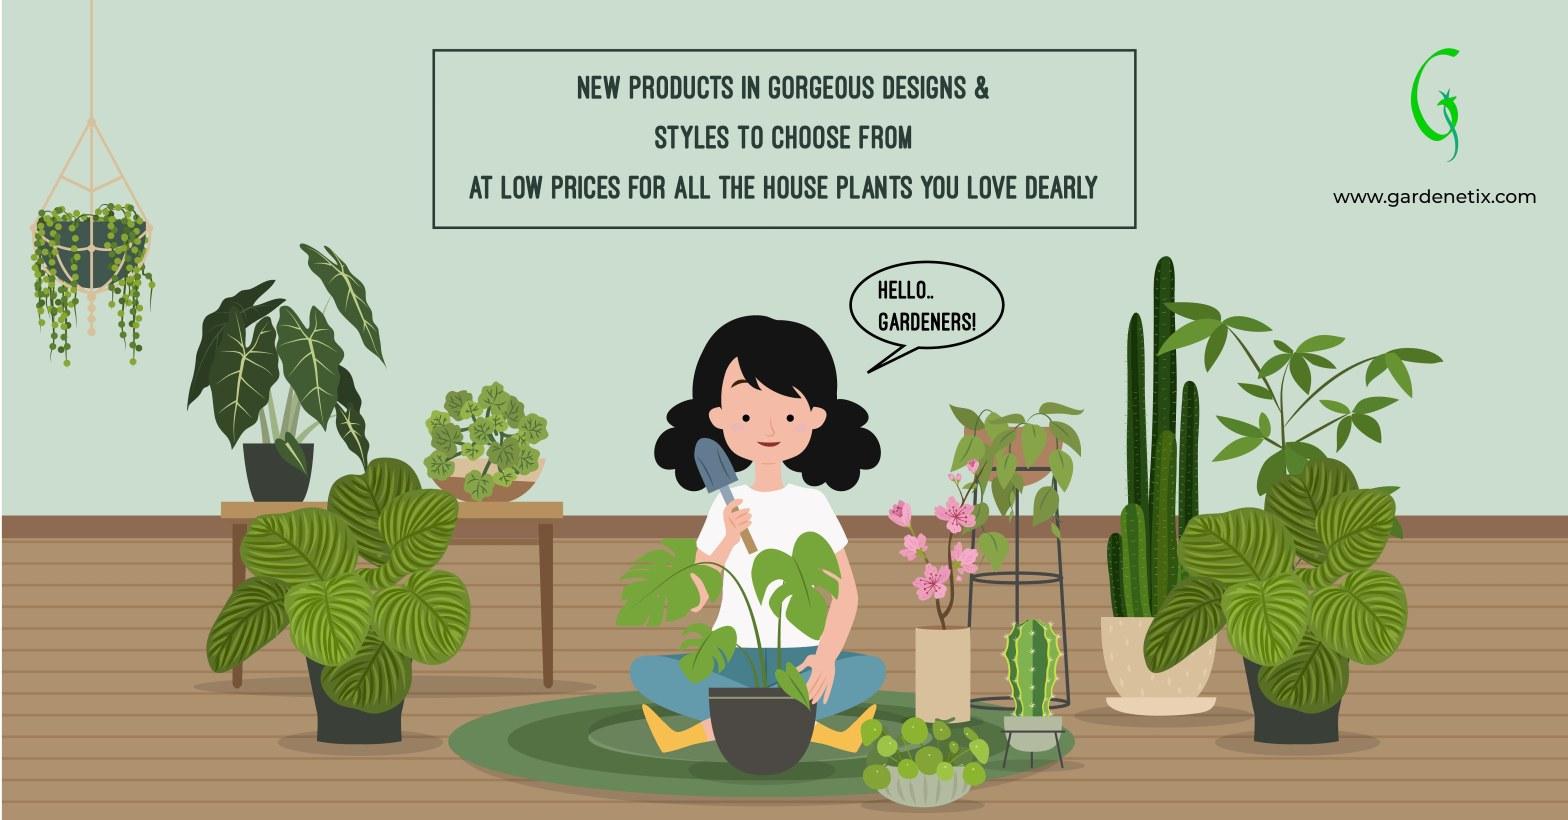 Gardenetix the garden store